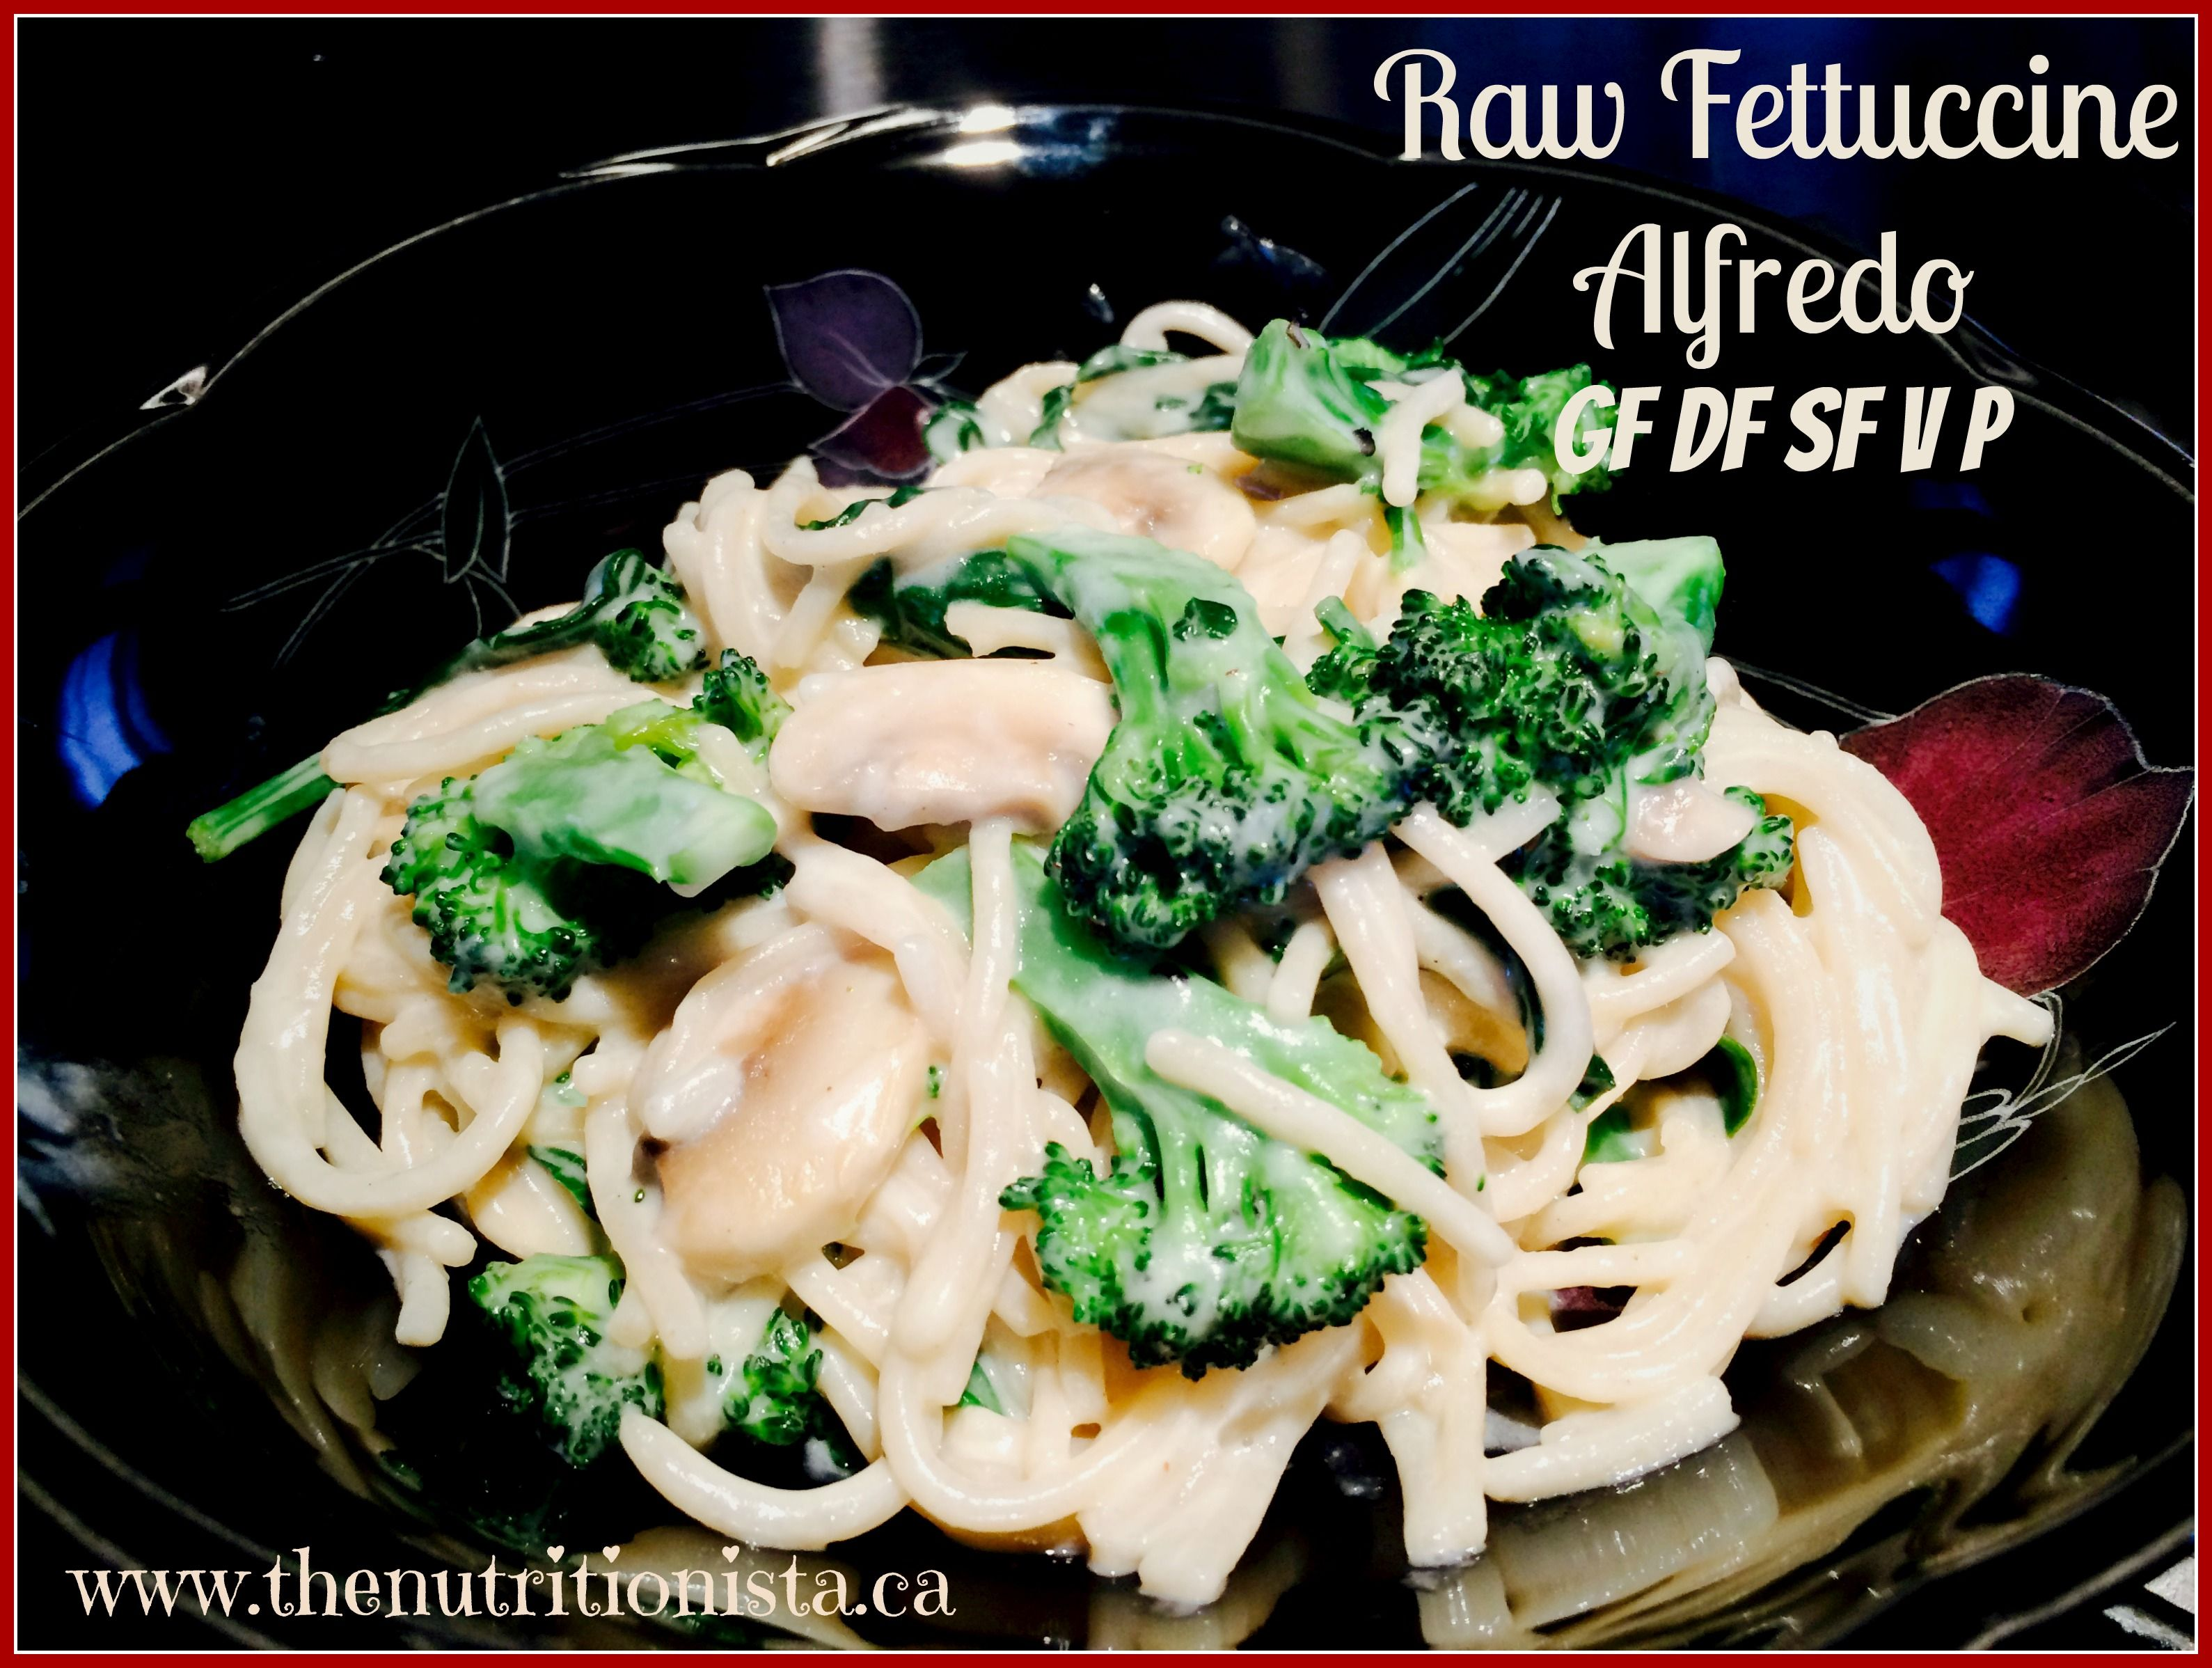 I'm making this gluten-free, paleo, vegan, raw Fettuccine Alfredo tonight! Via @bcnutritionista